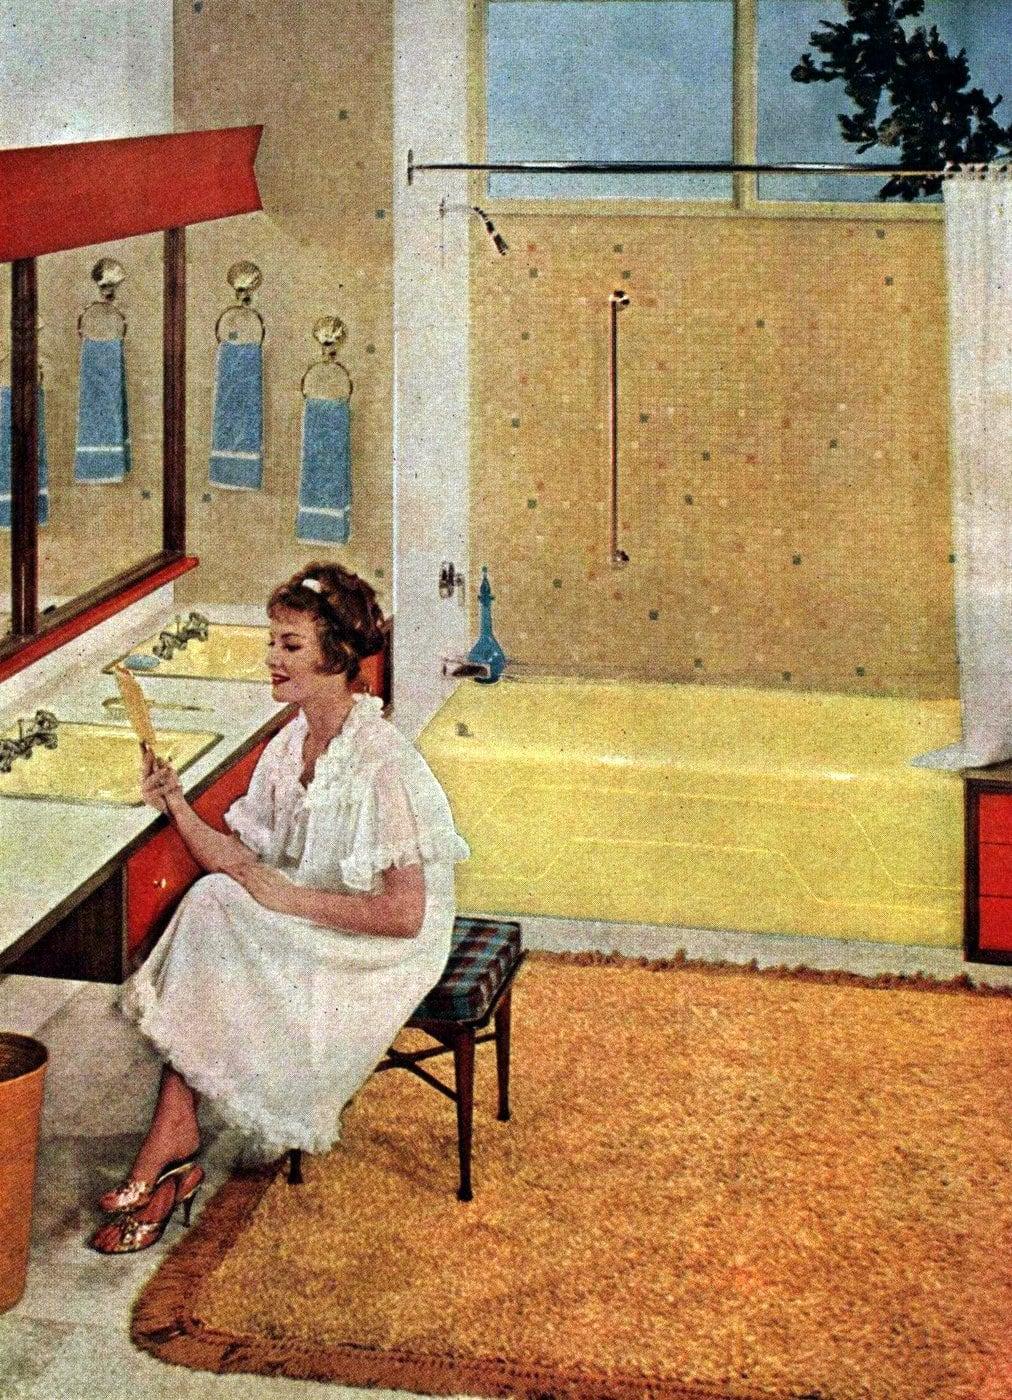 Vintage bathroom decor from 1962 (1)